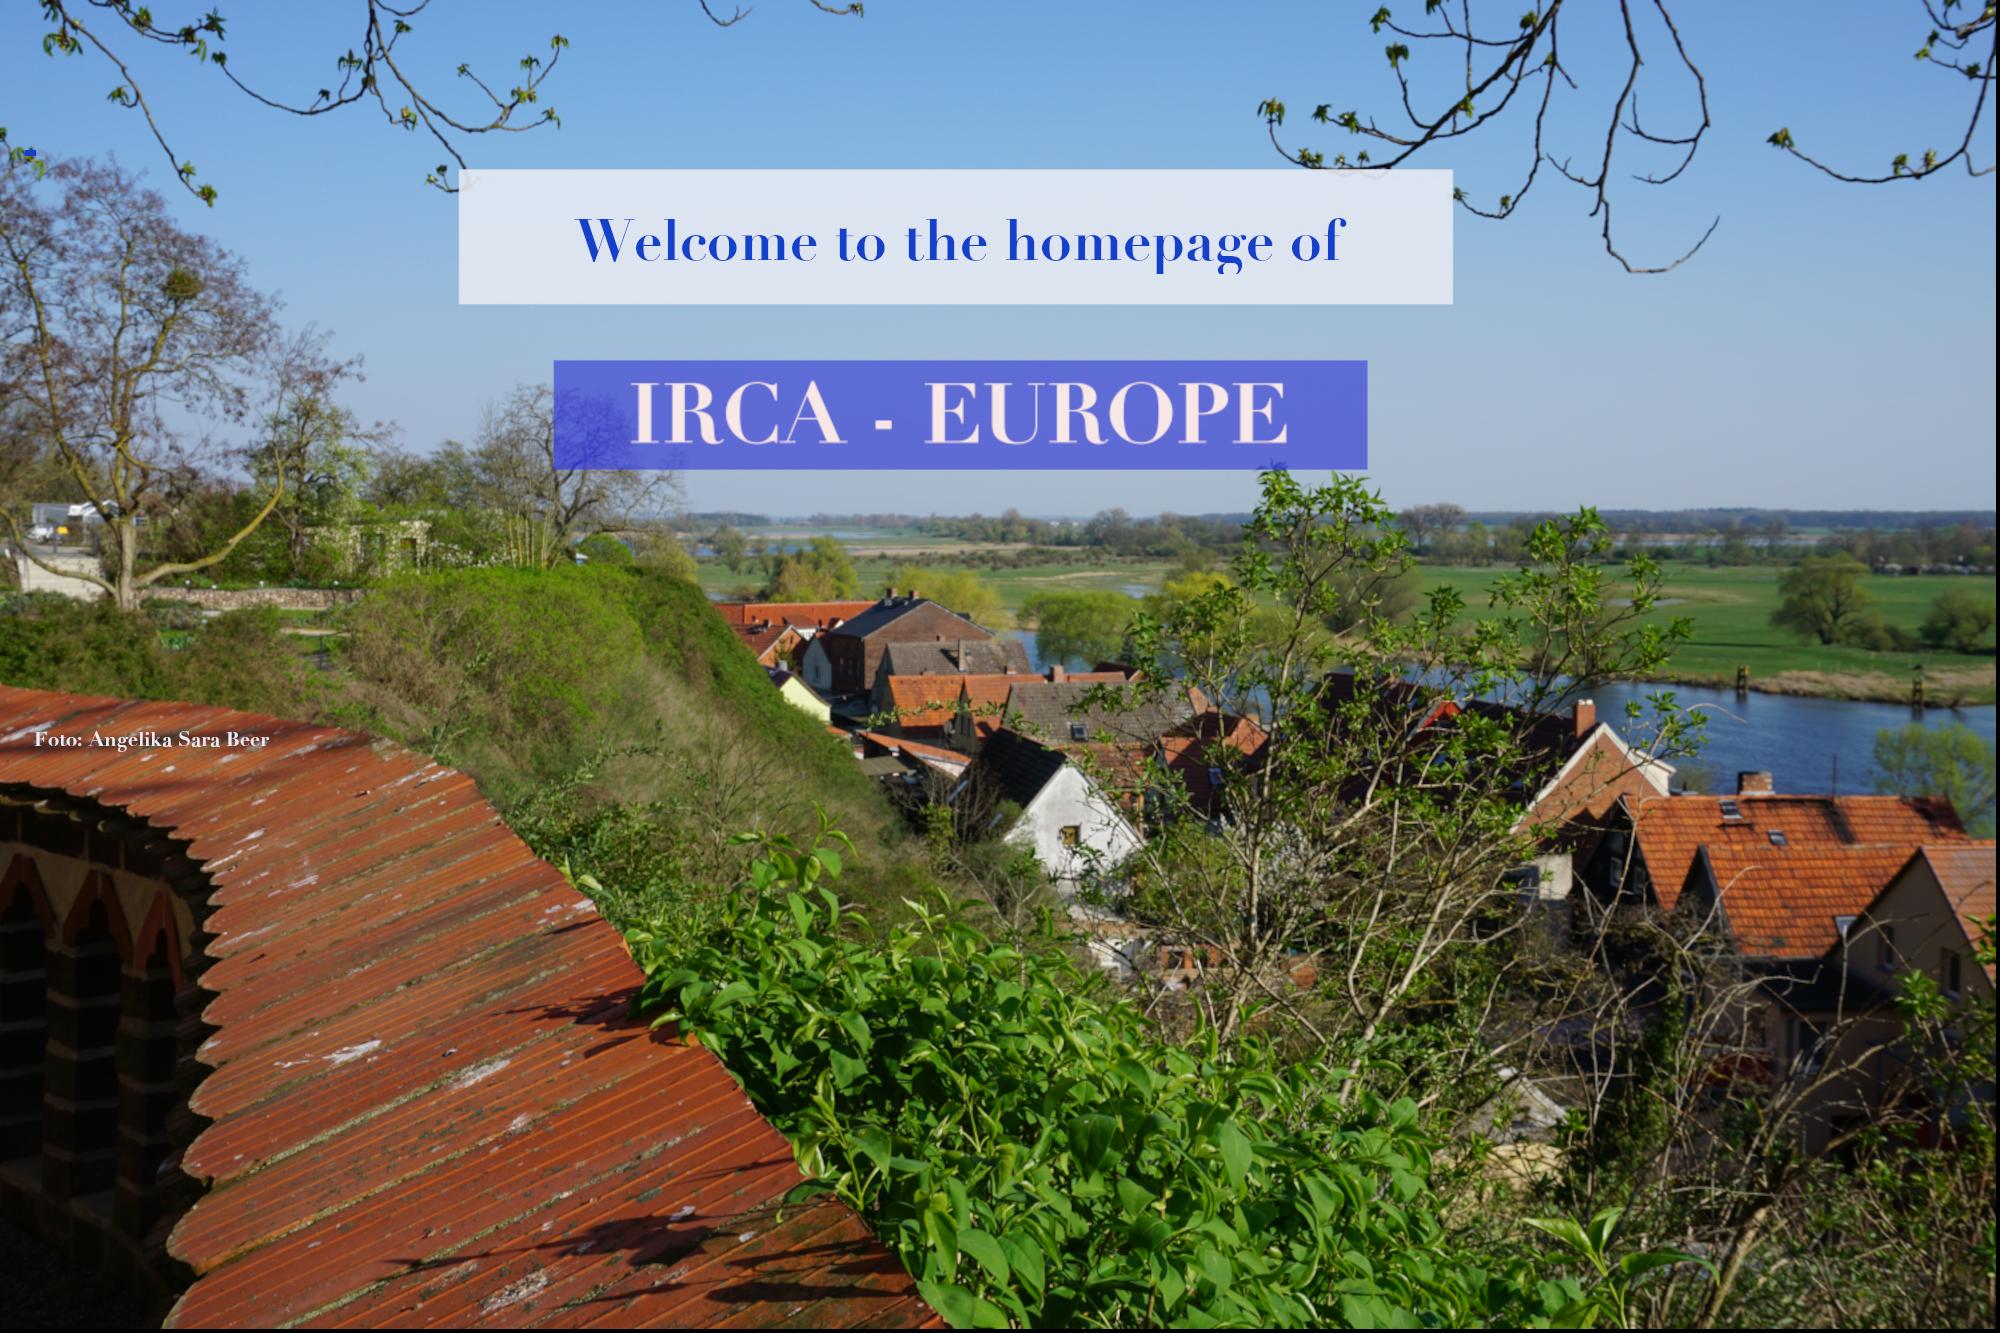 IRCA-Europe